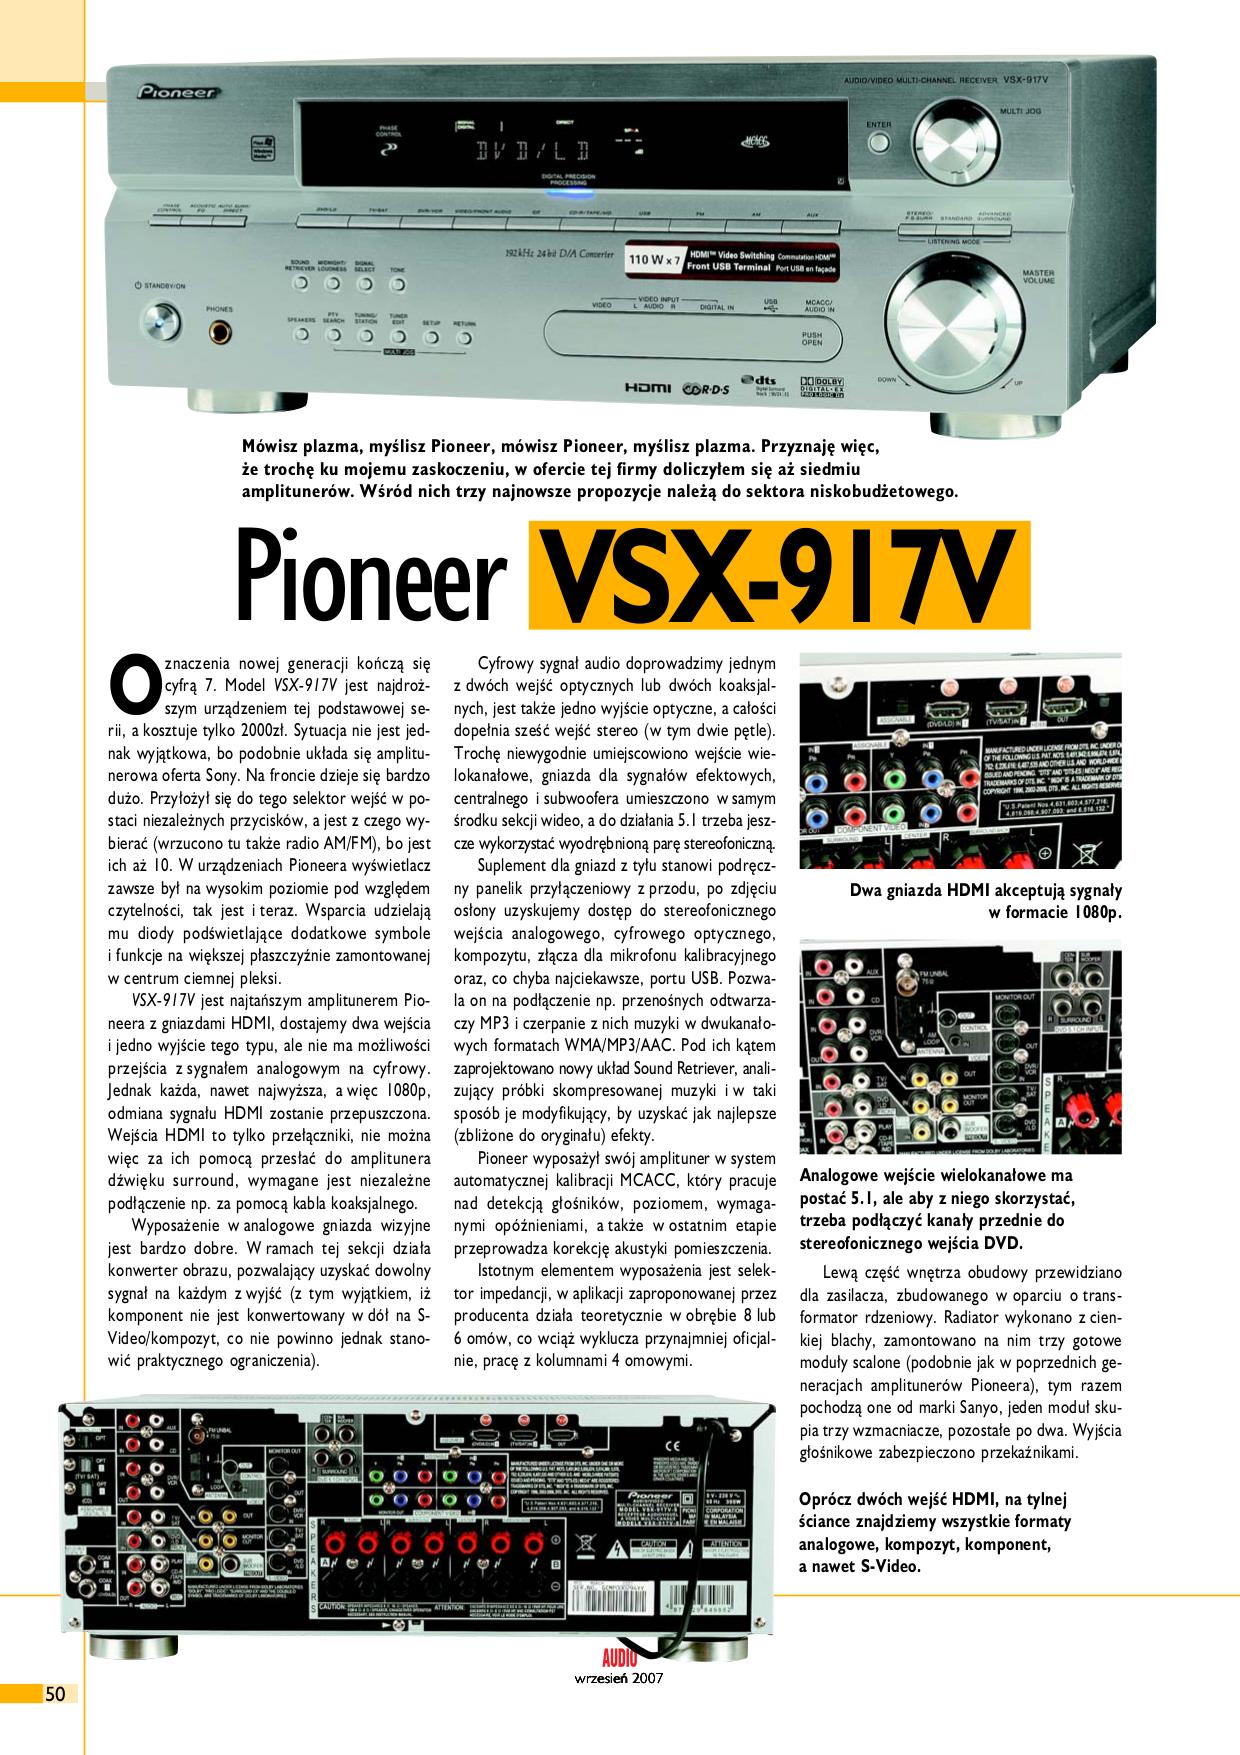 download free pdf for pioneer vsx 917v k receiver manual rh umlib com pioneer vsx 917v specs pioneer vsx-917v-k specs